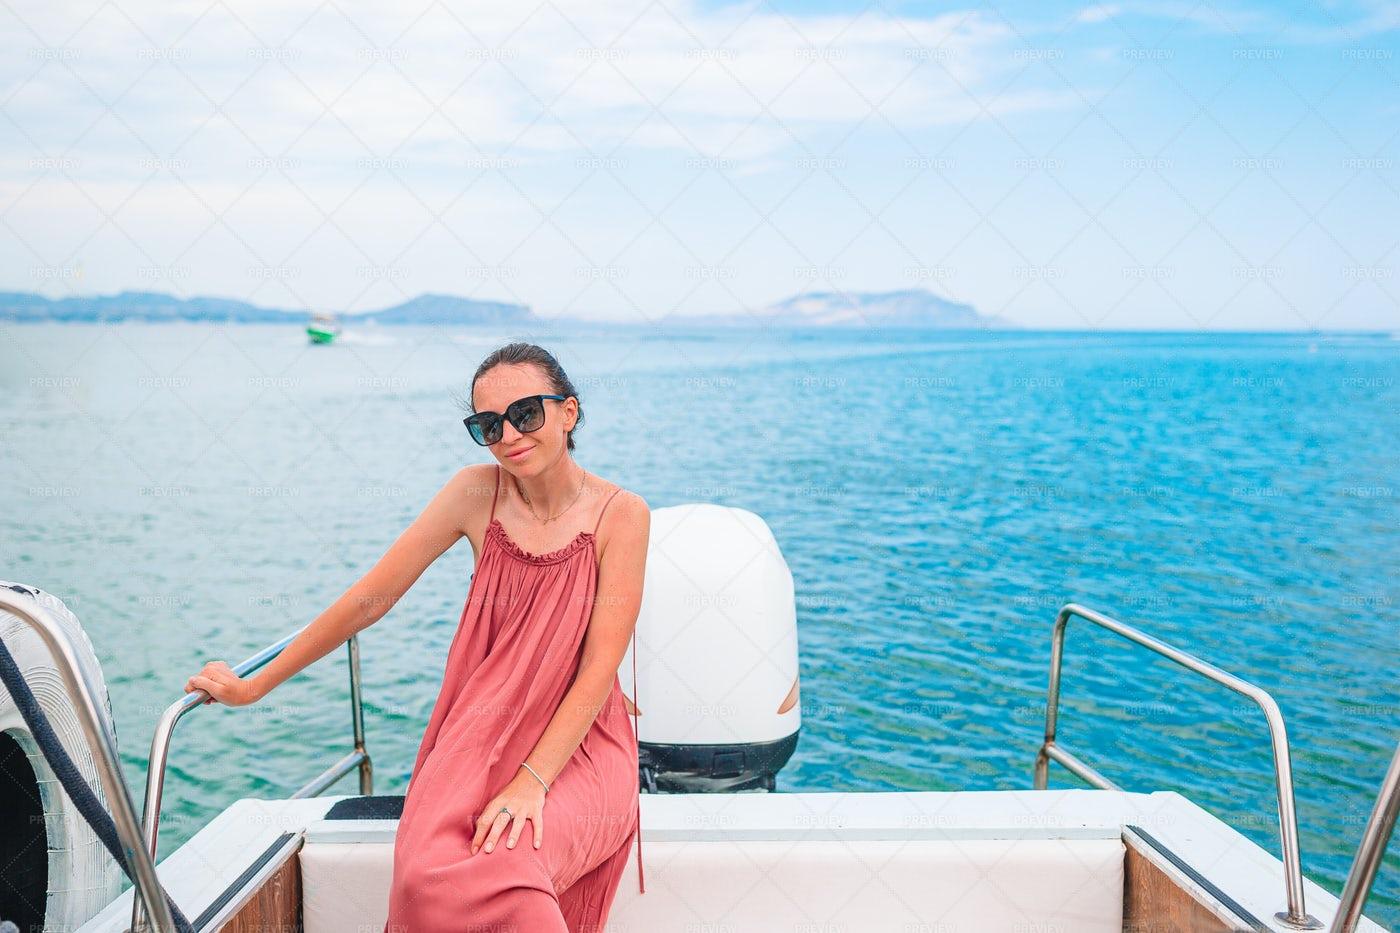 Woman Sailing On Boat: Stock Photos